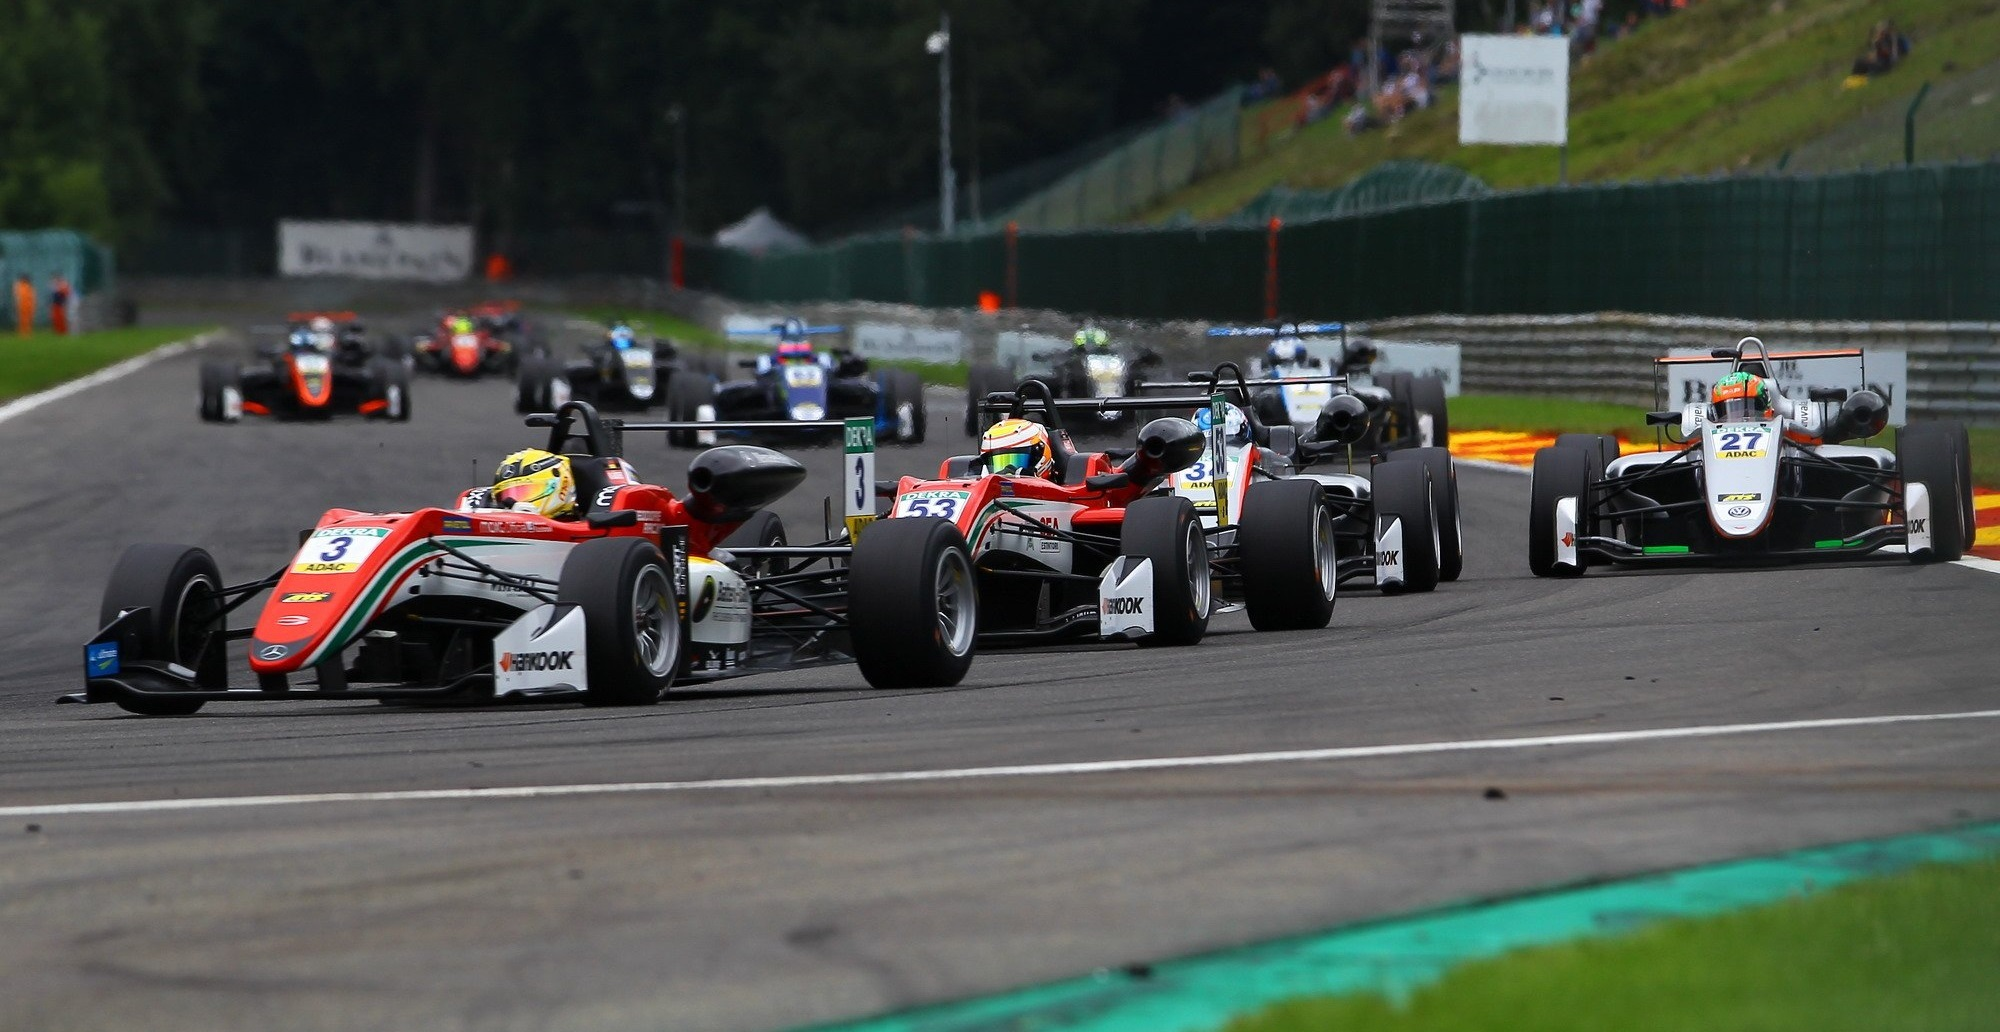 Salida Fórmula 3 Spa 2017